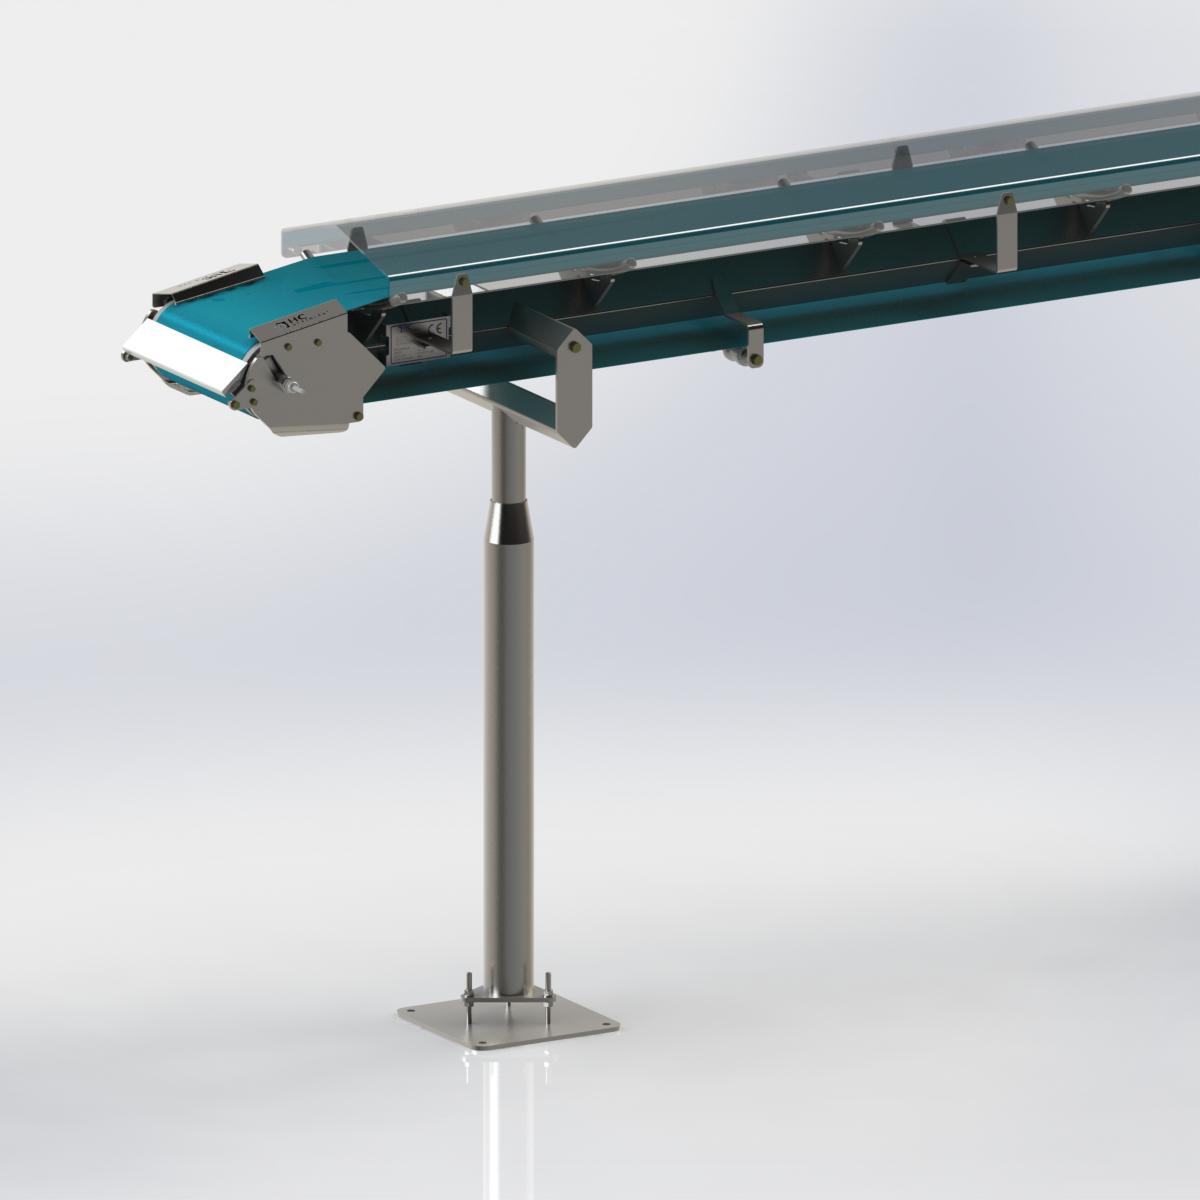 Conveyor ground stand